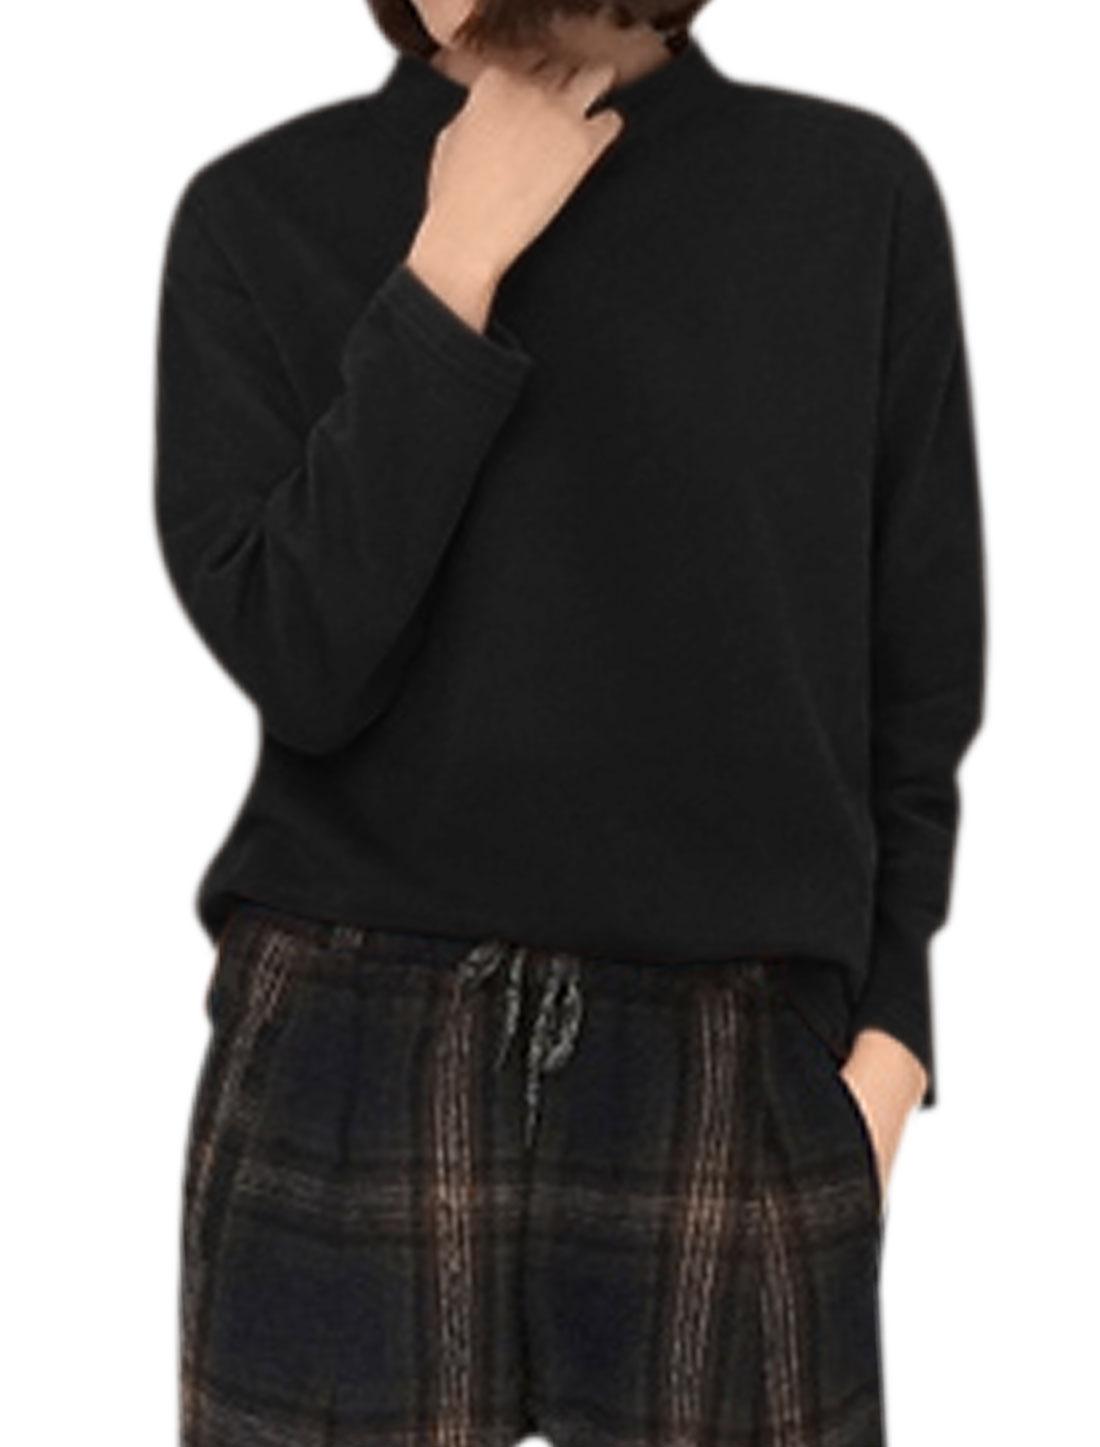 Ladies Long Sleeves Stand Collar Loose Tee Shirt Black S